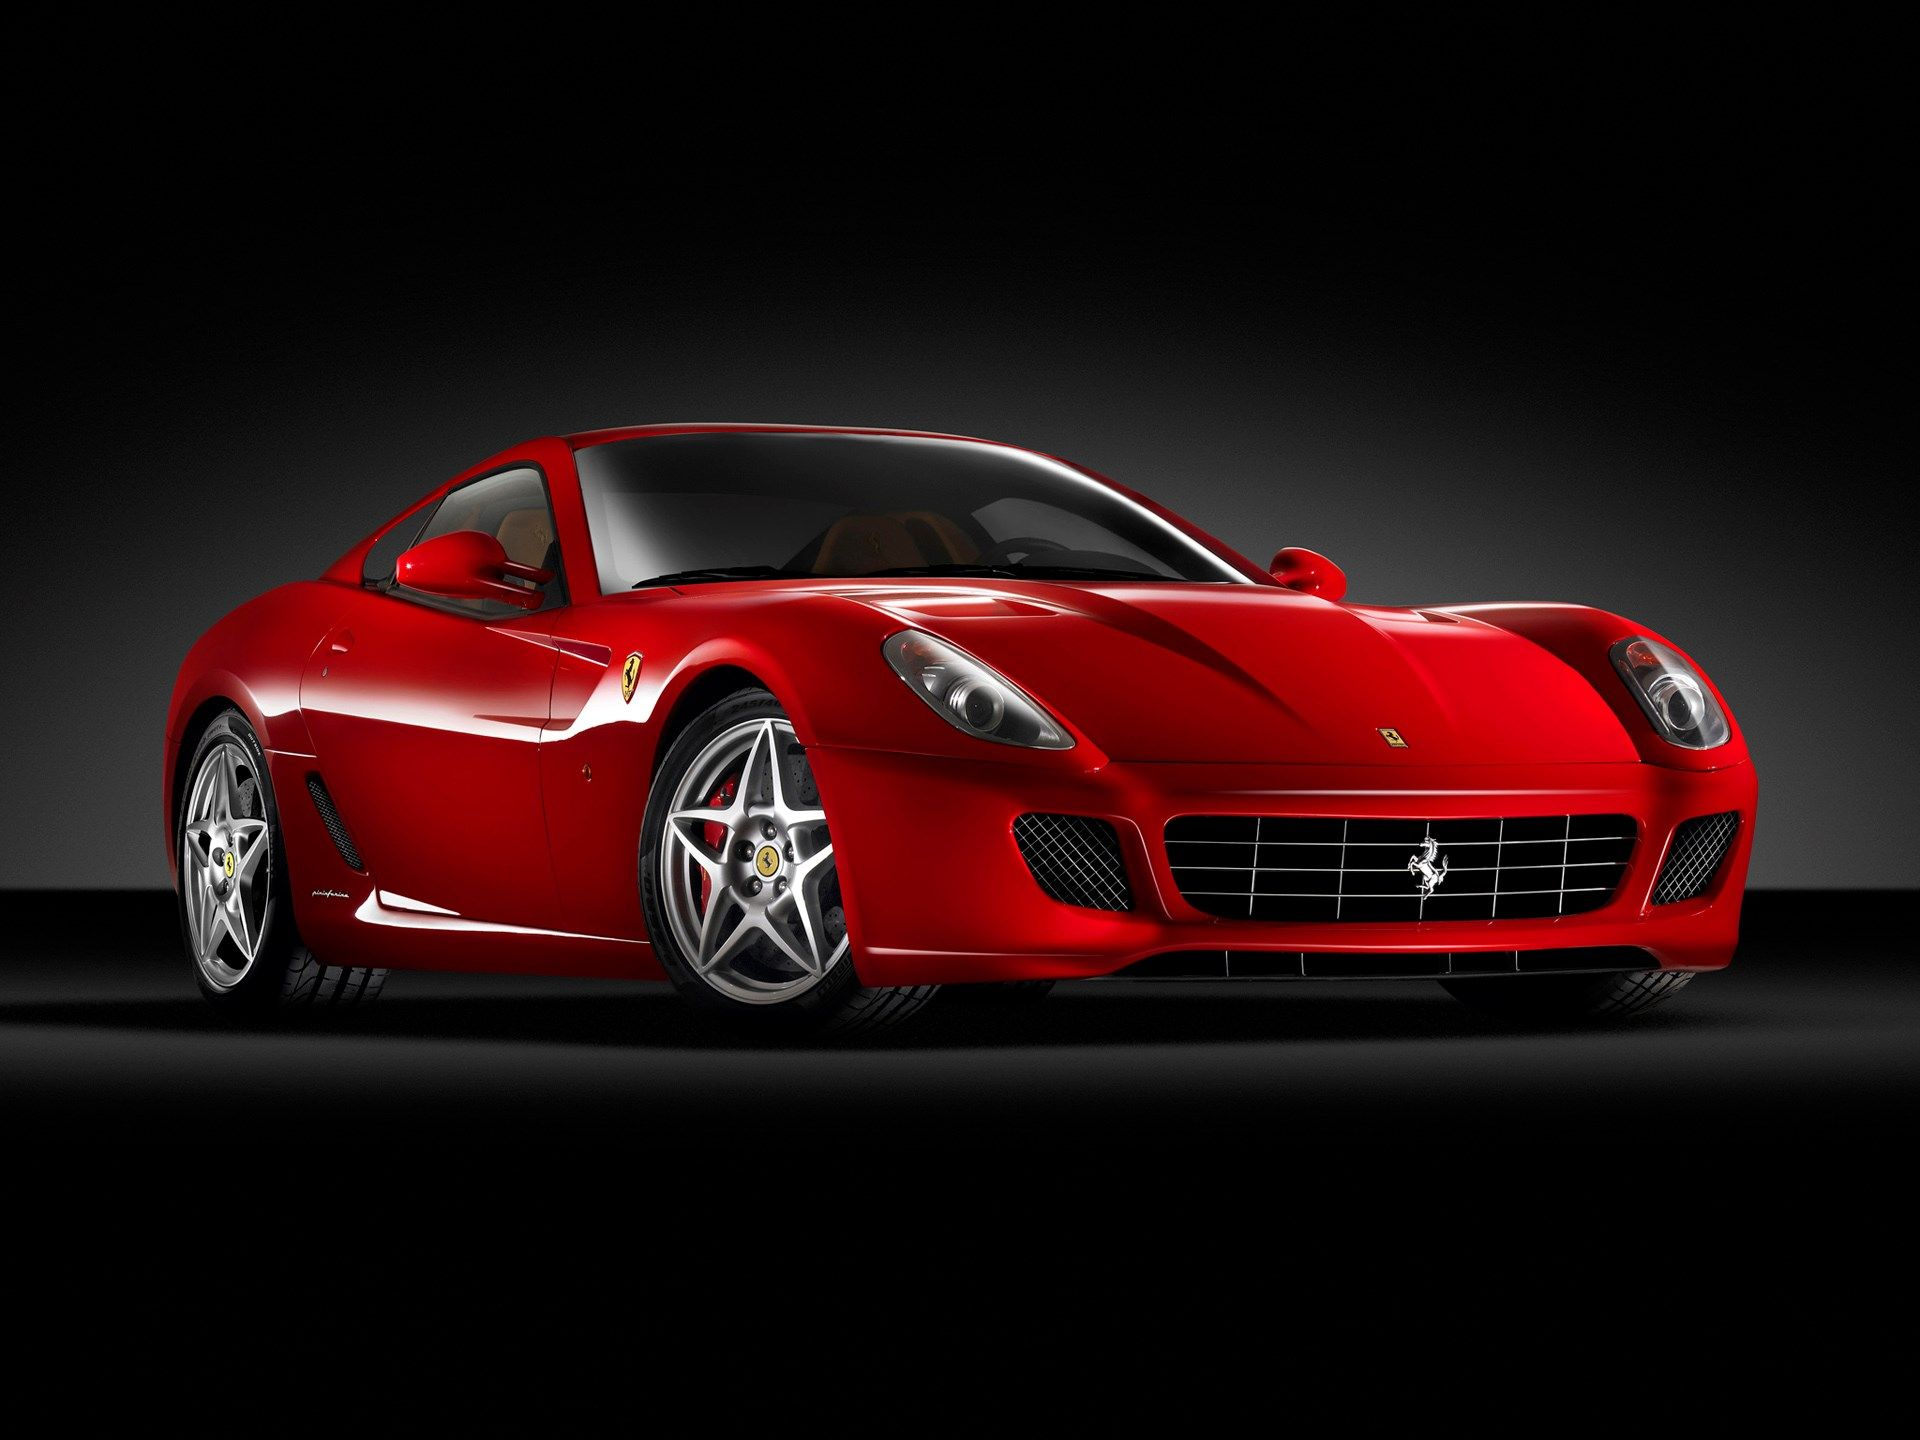 Ferrari Ferrari 599 Ferrari Car Ferrari